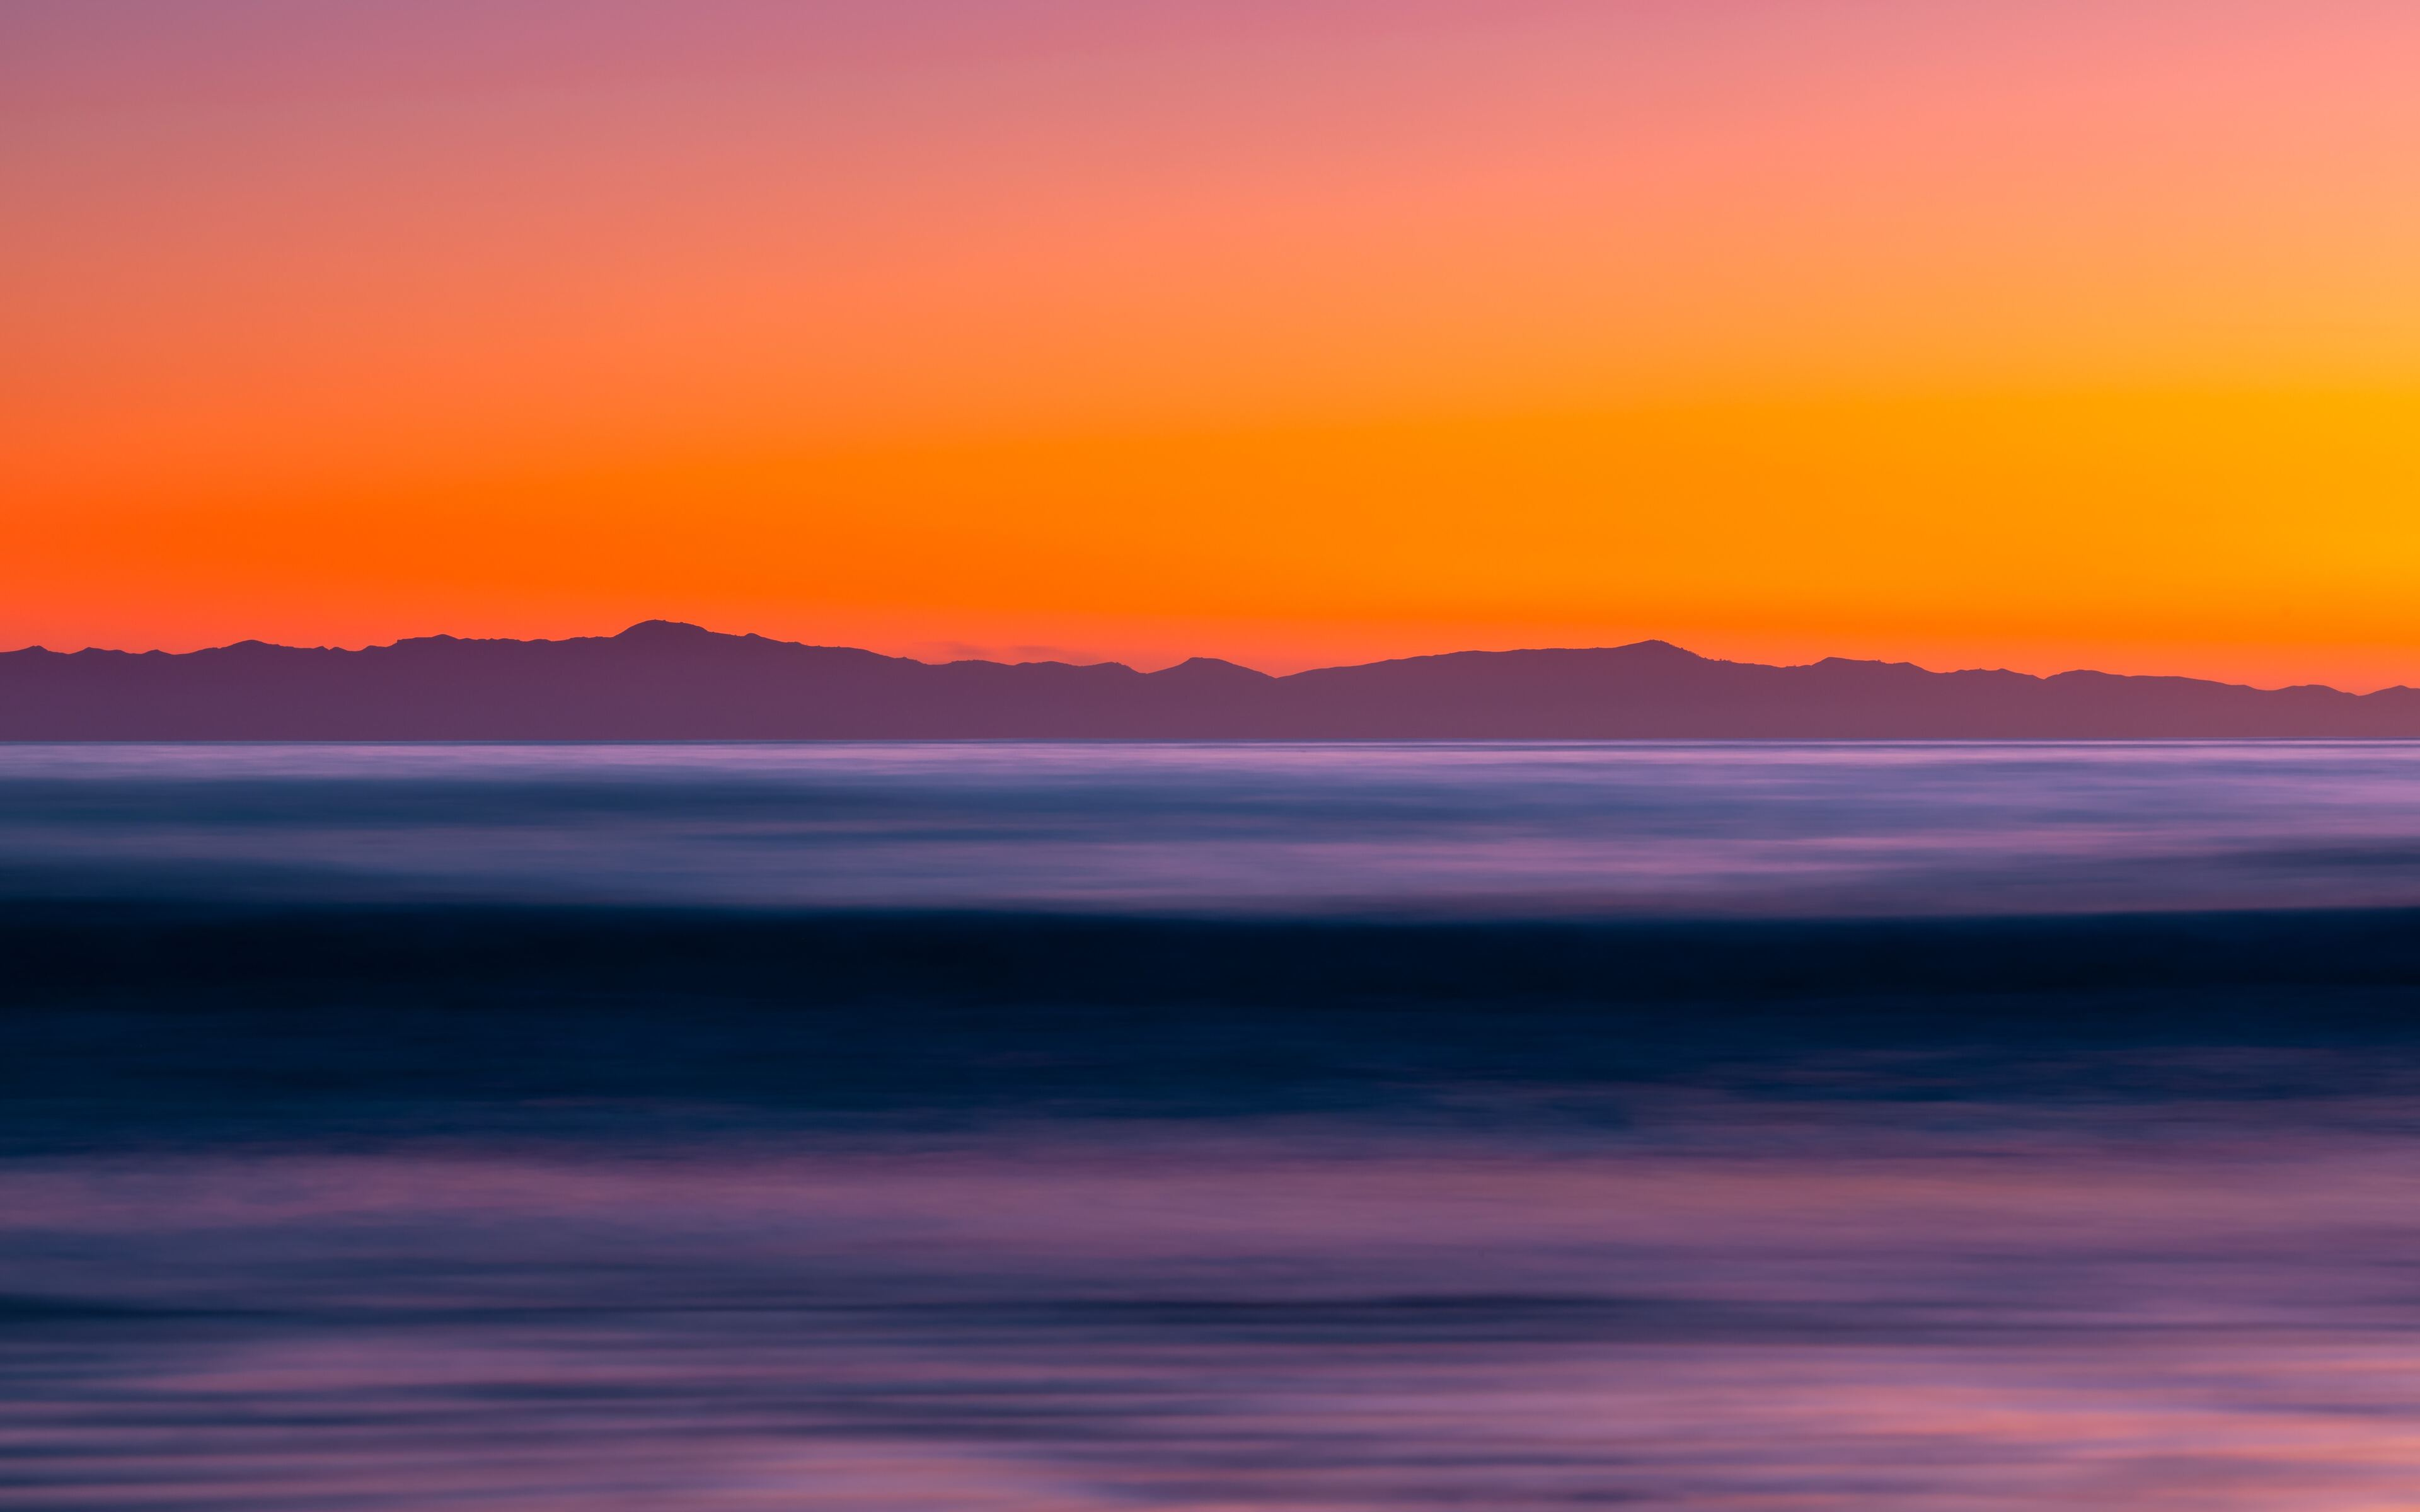 sea-long-exposure-sunset-5k-18.jpg